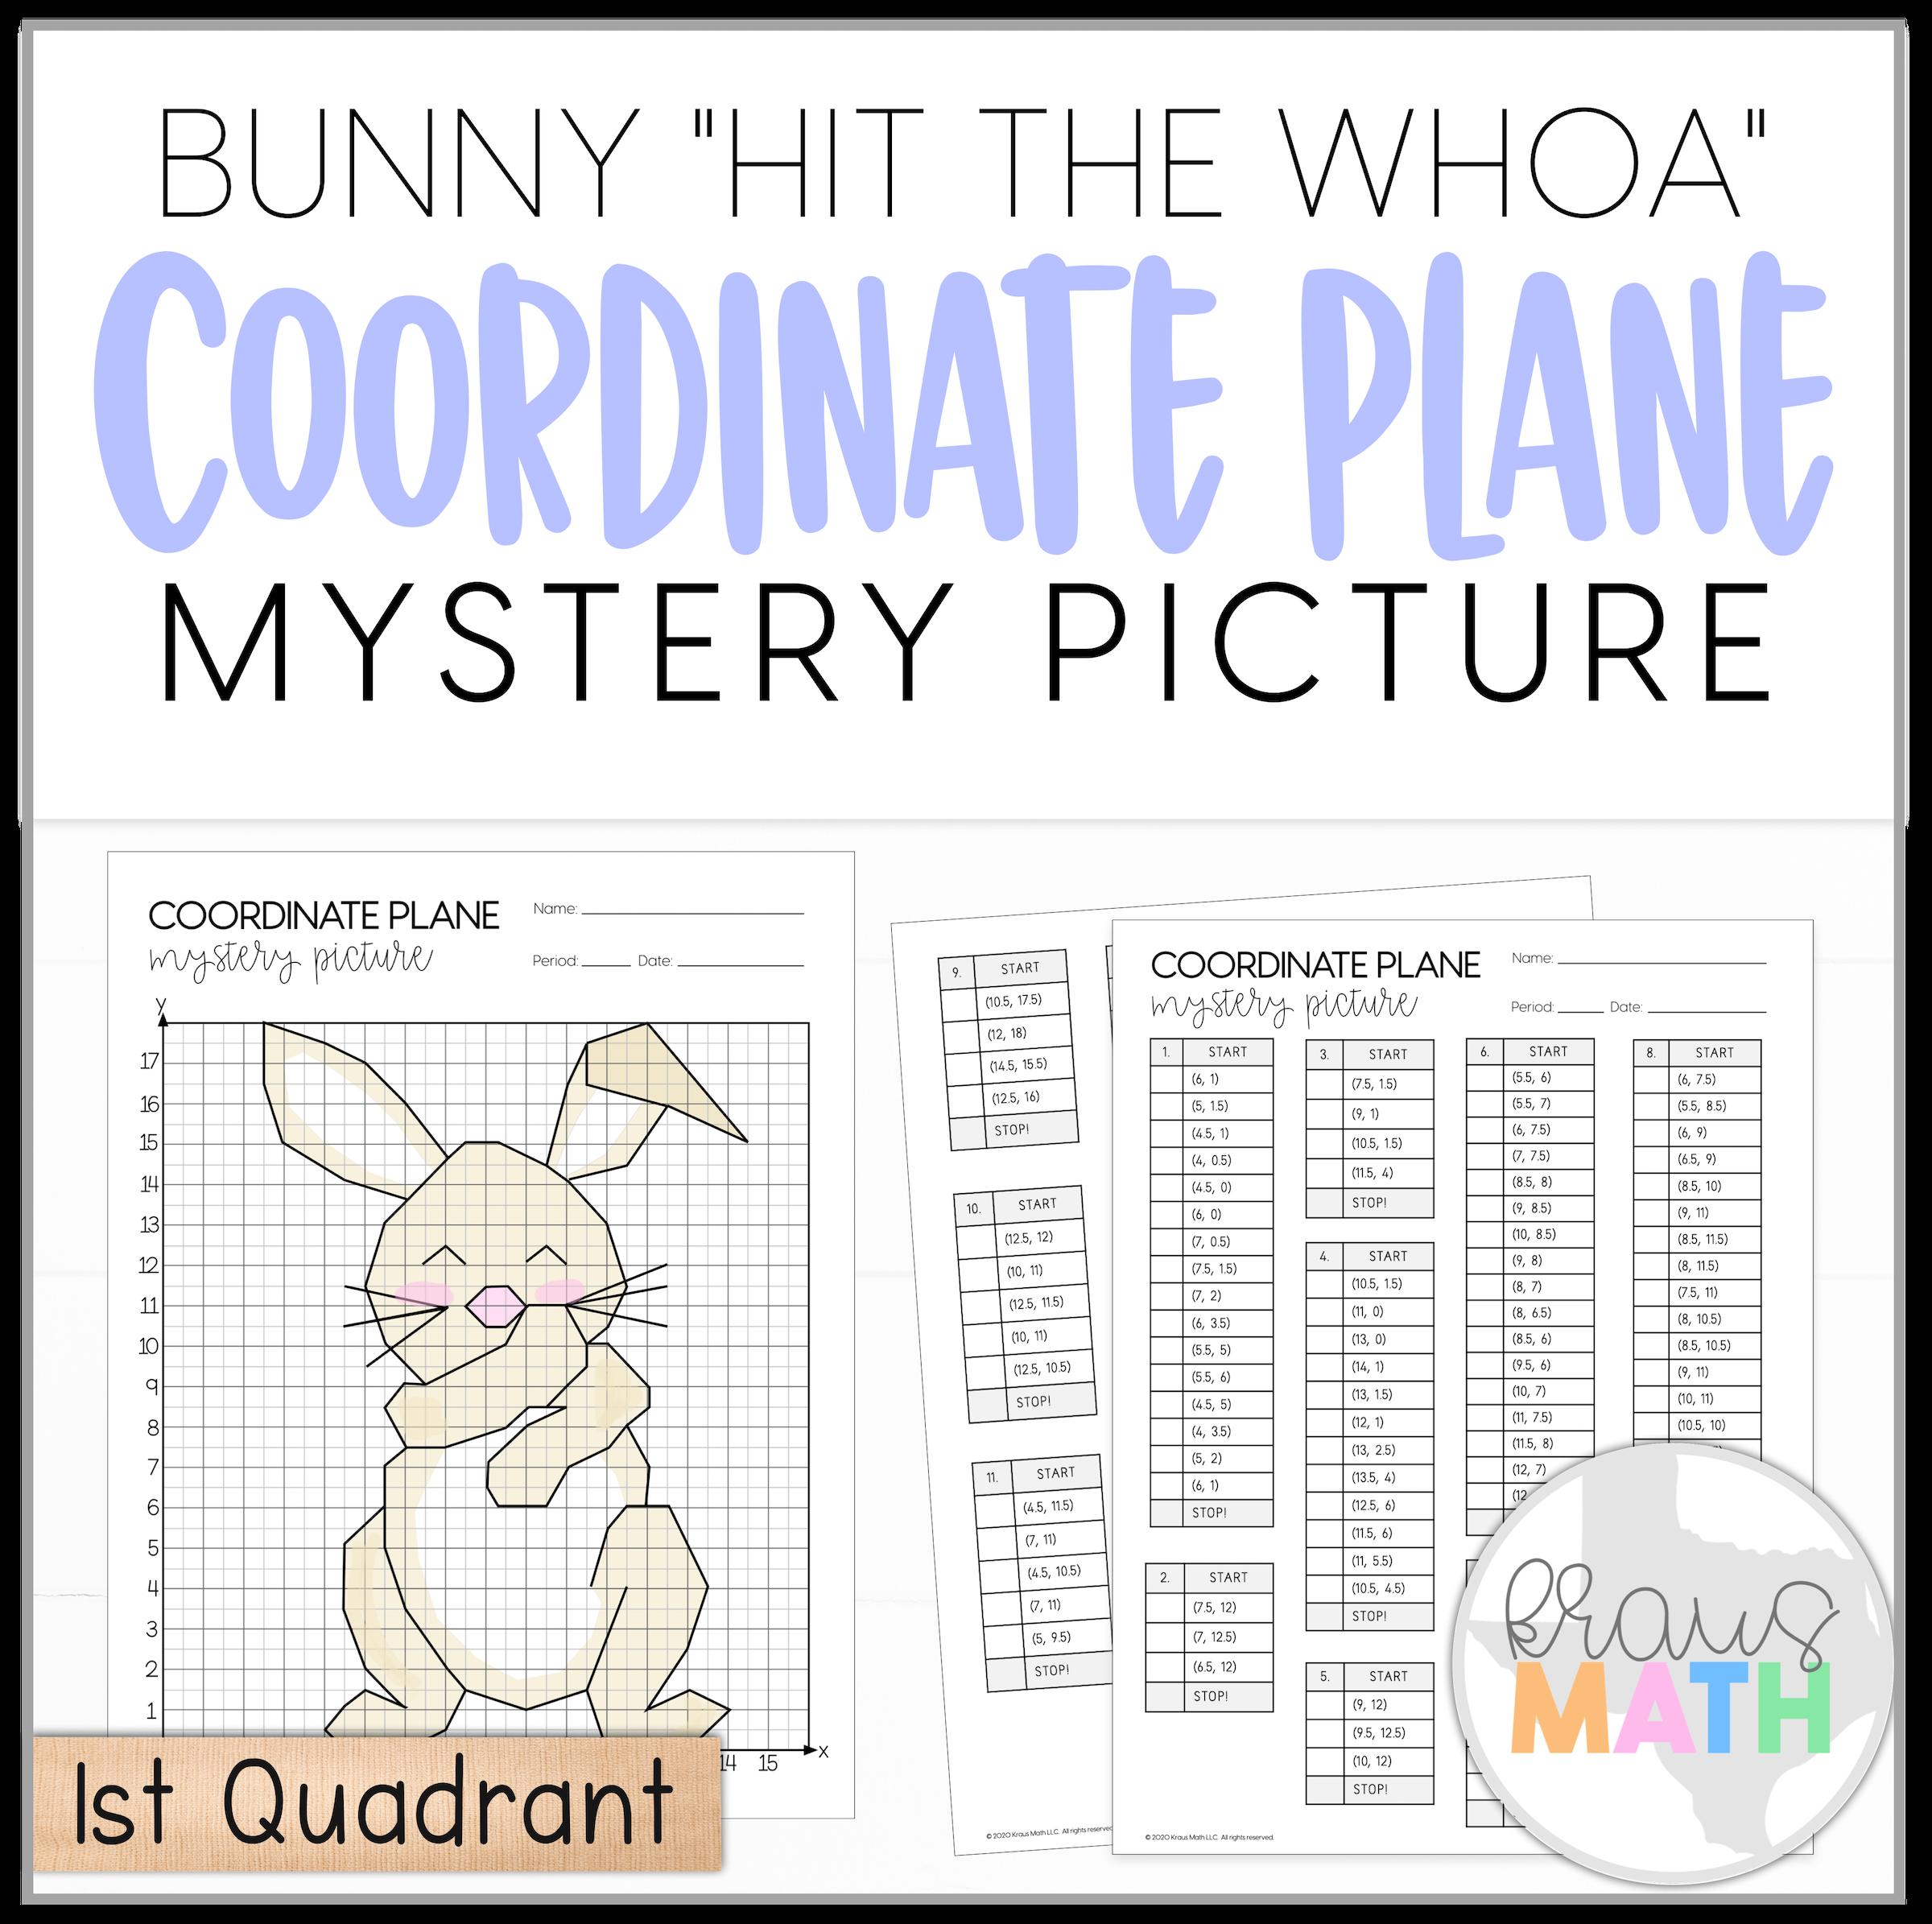 Bunny Hit The Woah Dance Coordinate Plane Mystery